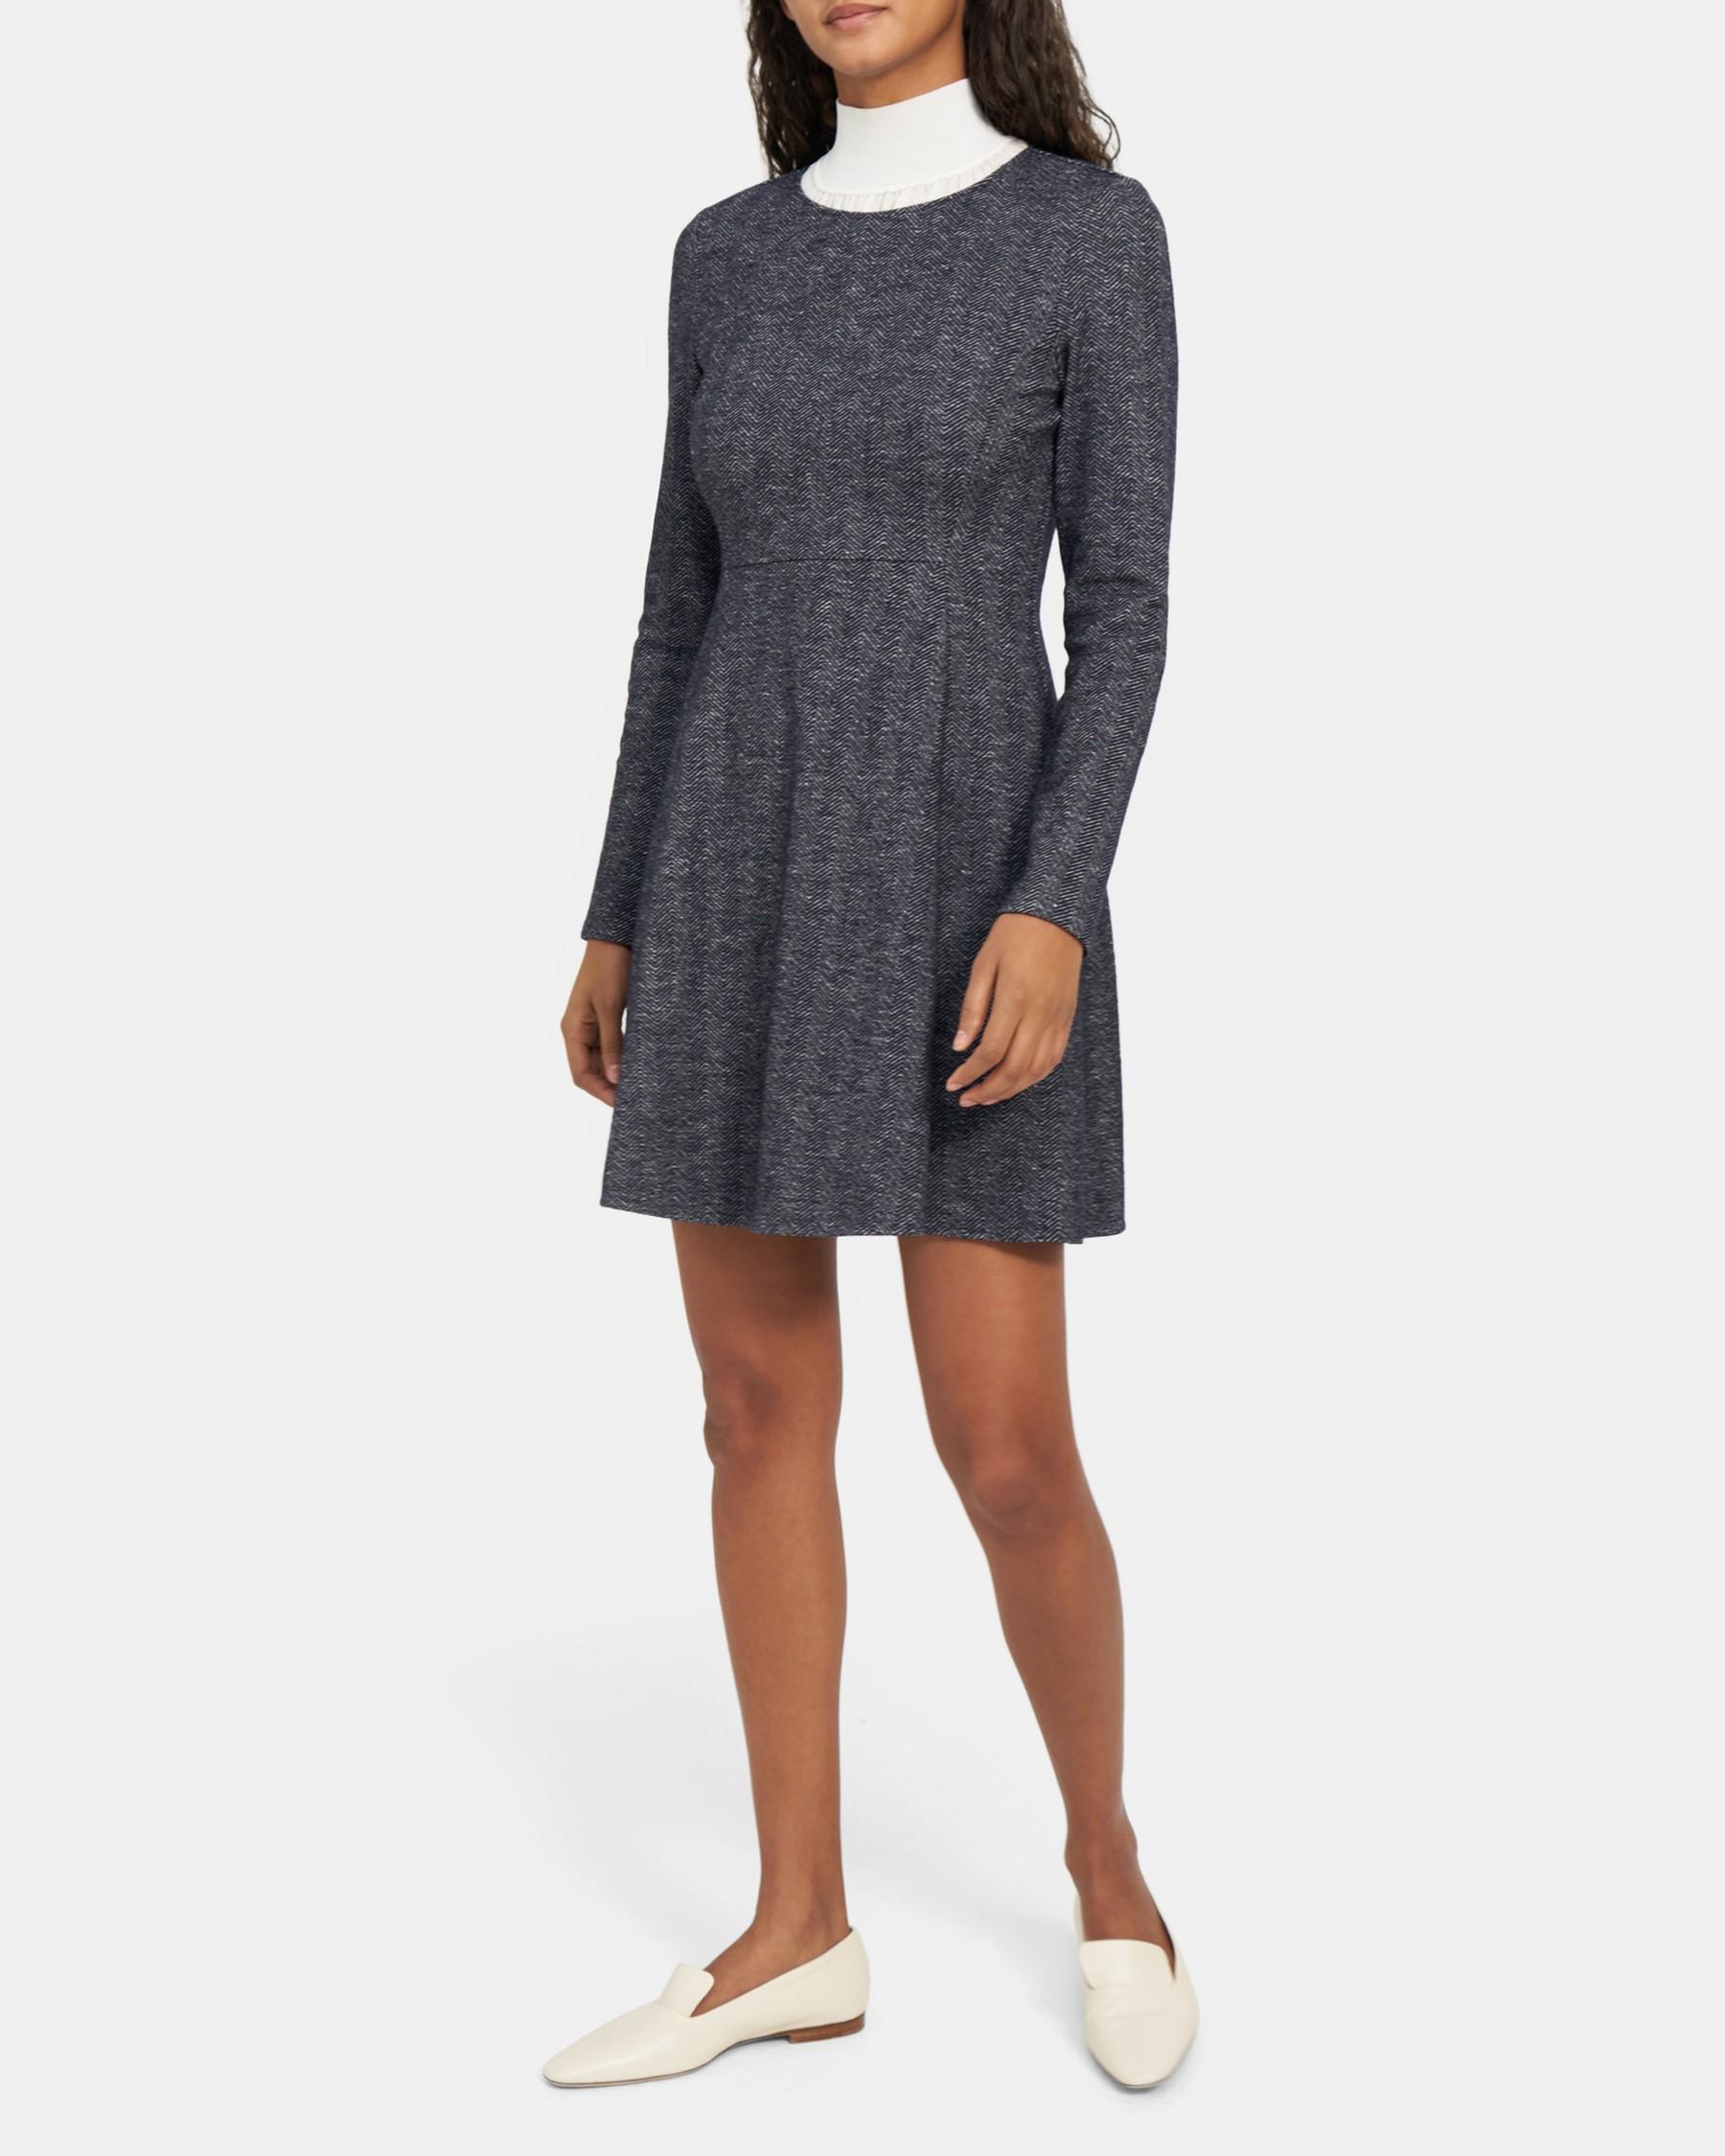 Albita Long-Sleeve Dress in Chevron Knit   Theory